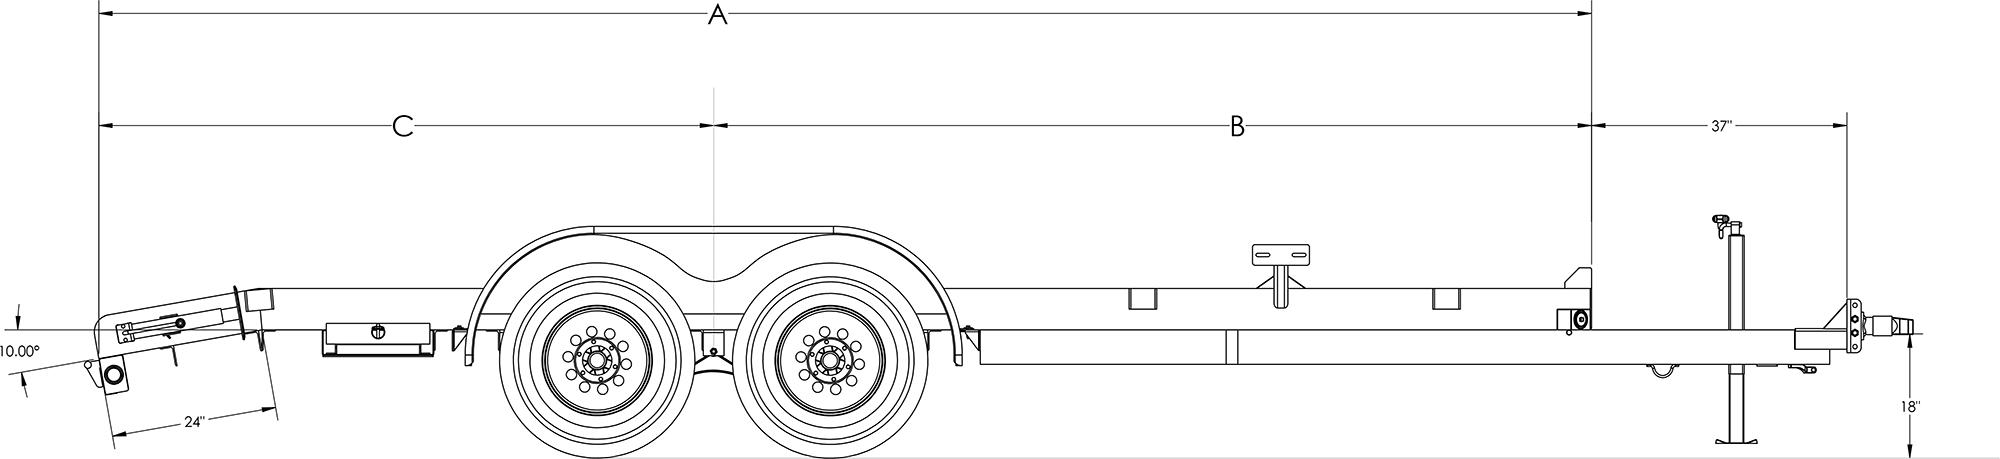 Pro Series Tandem Axle Car Hauler